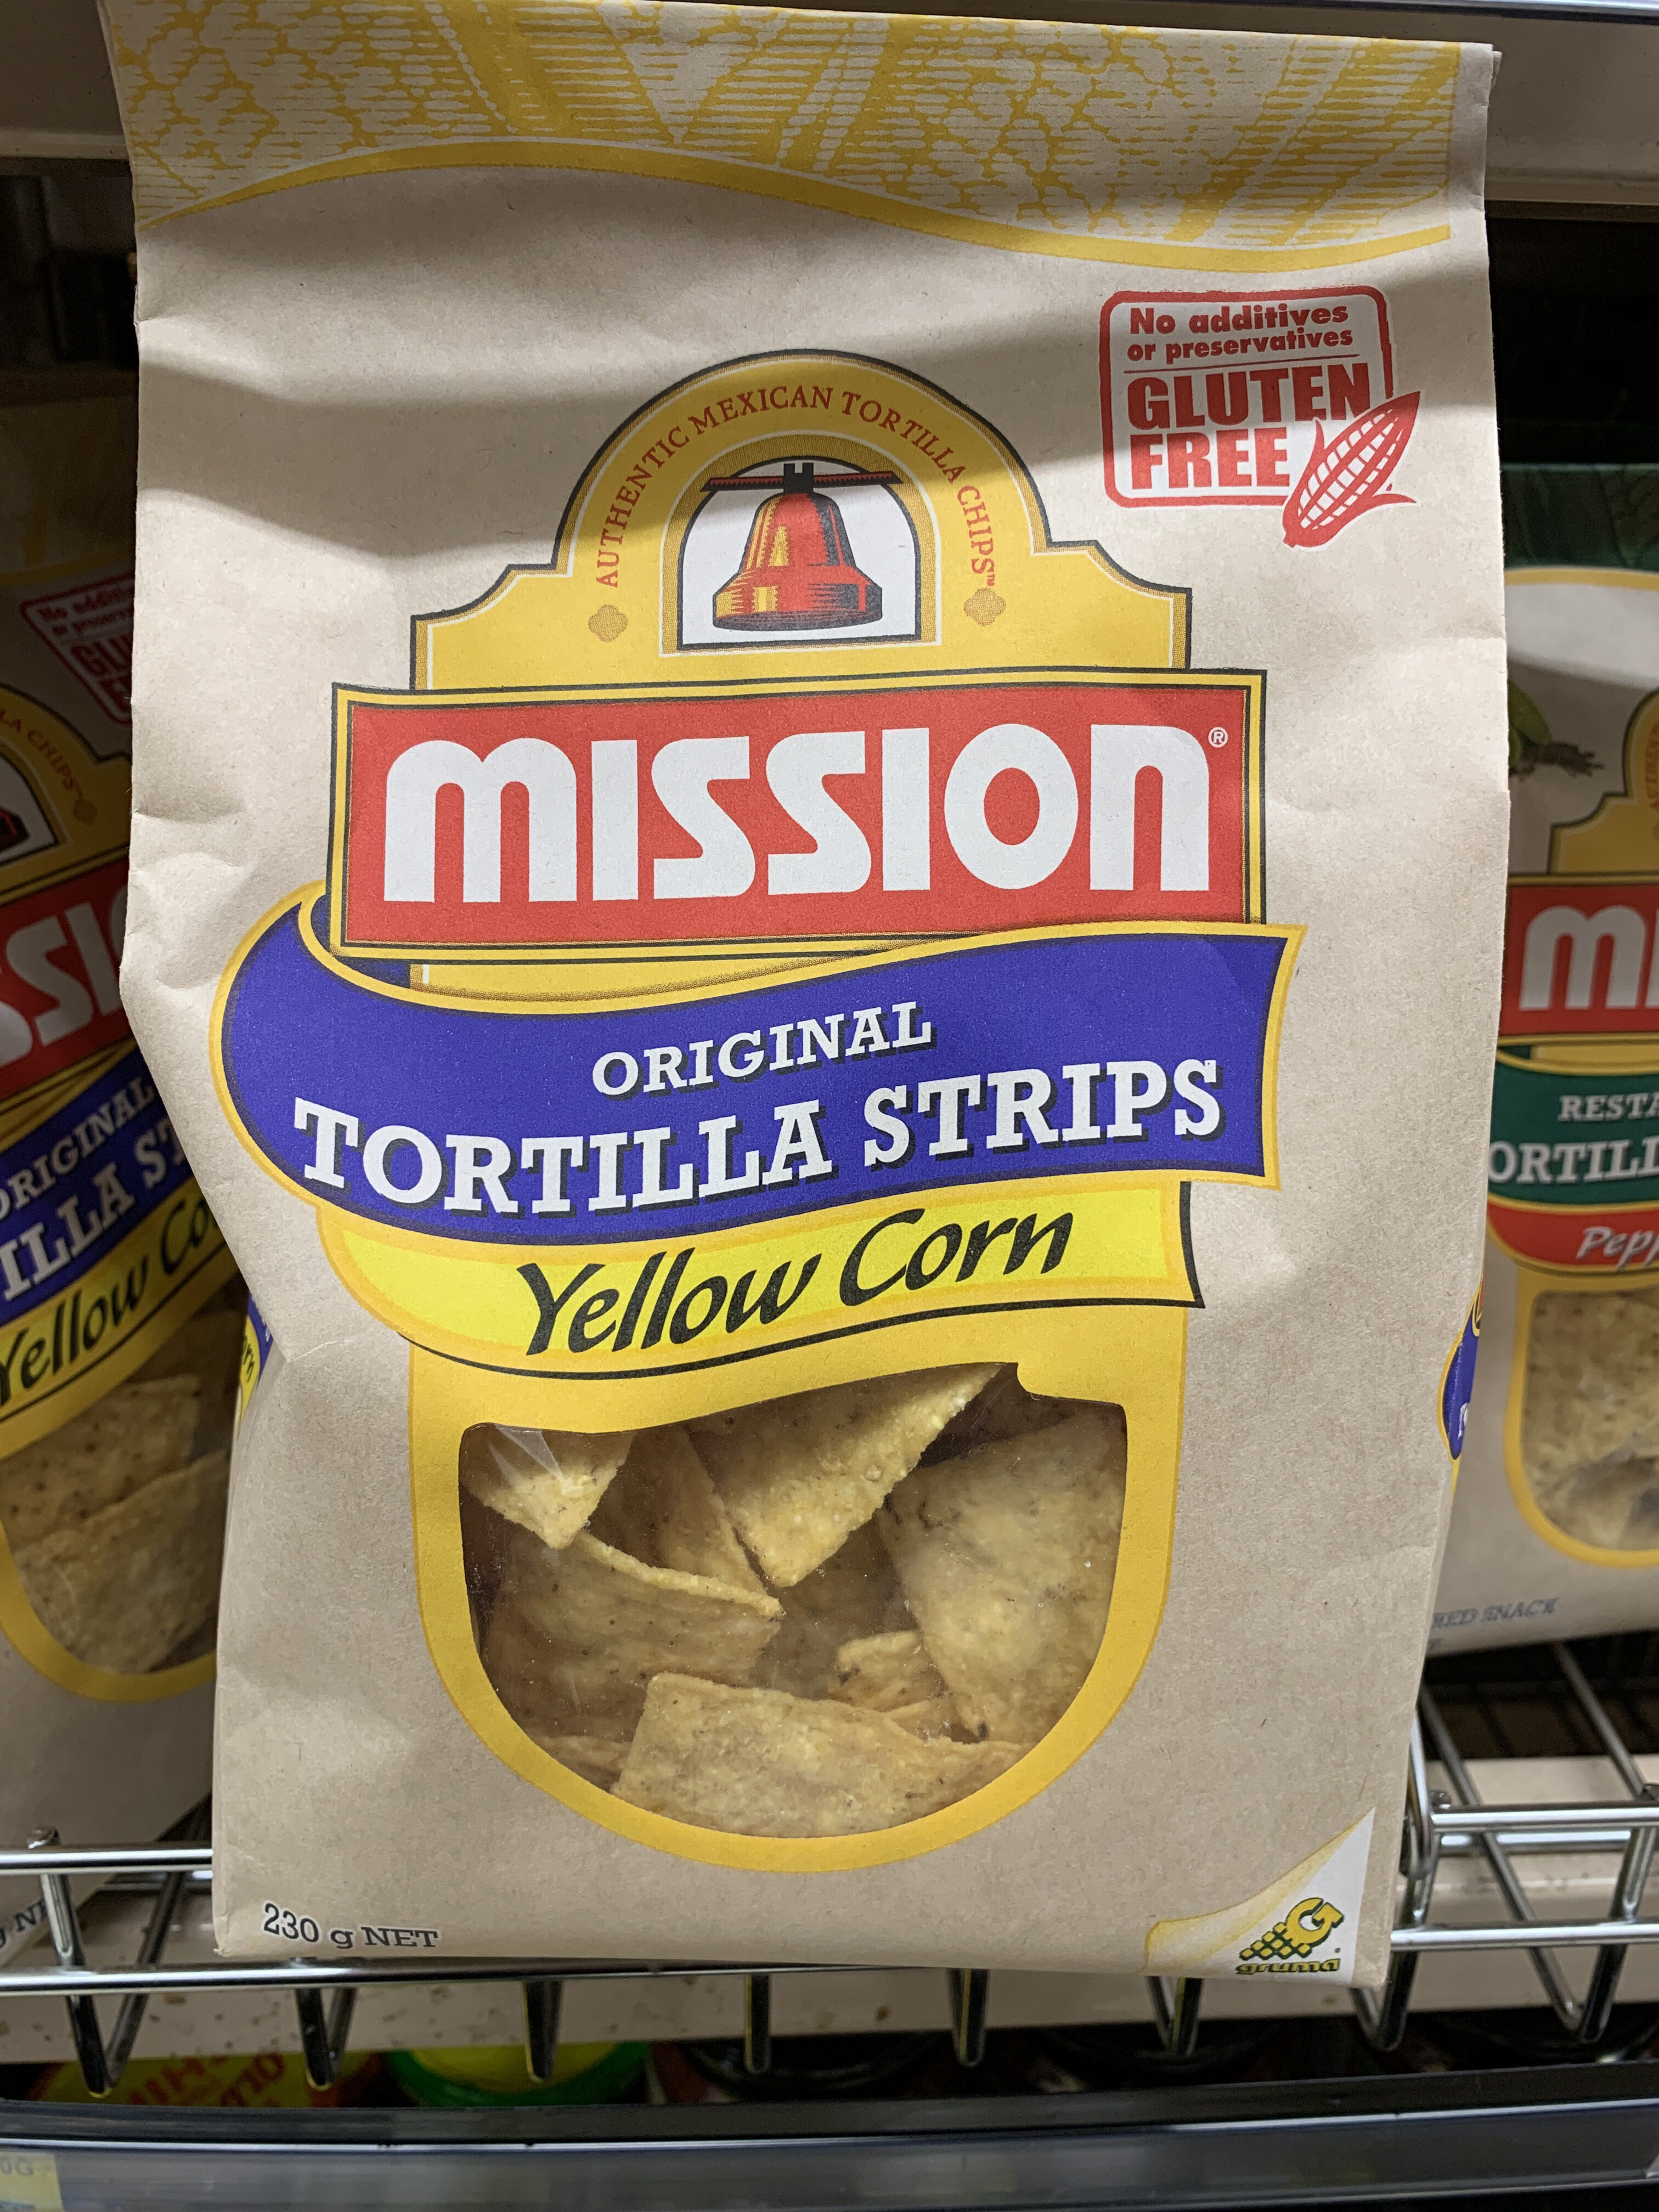 Mission original tortilla strips yellow corn - Product - en